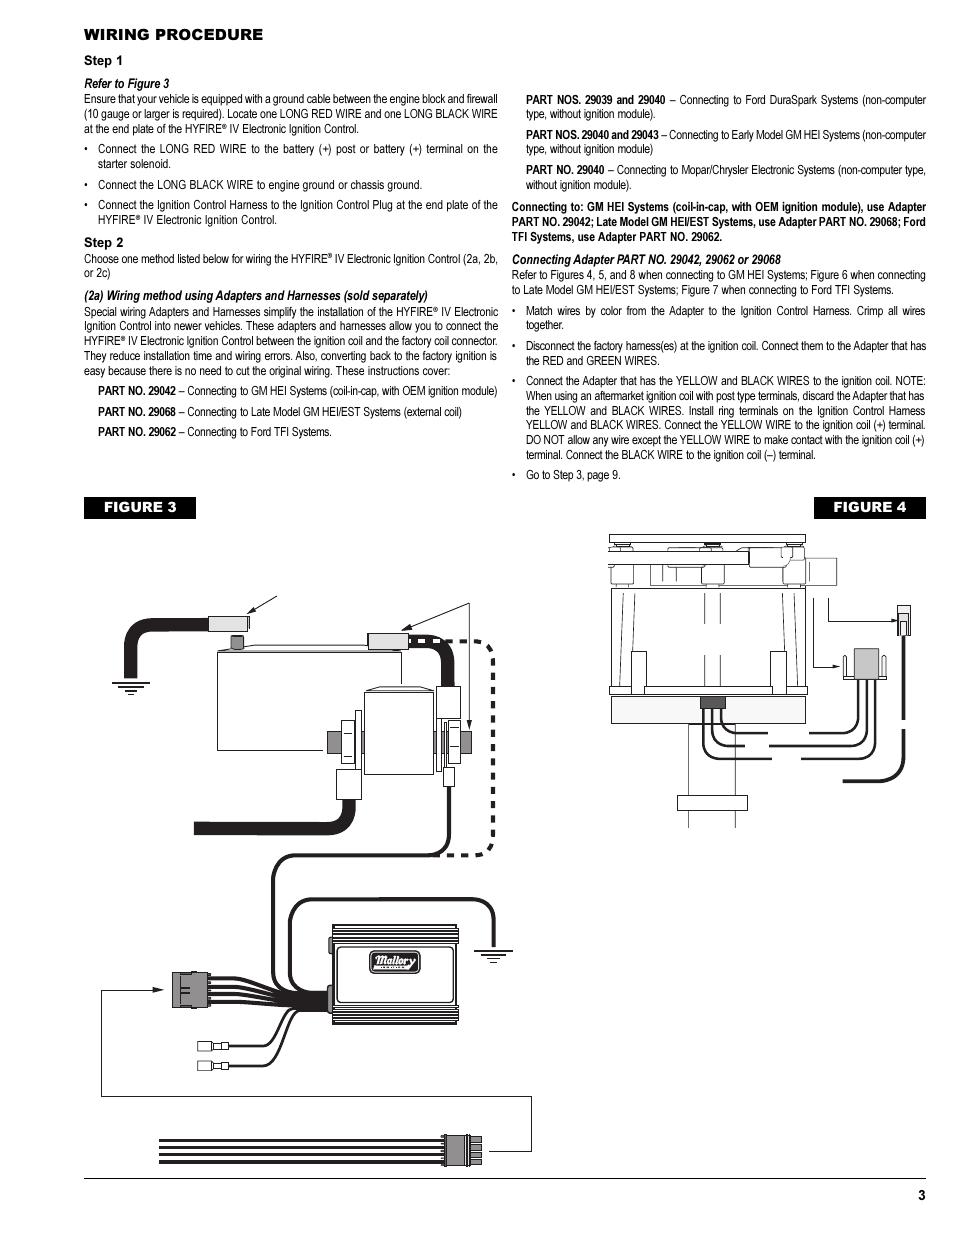 Mallory Hyfire 6al Wiring - Wiring Diagrams Schematics